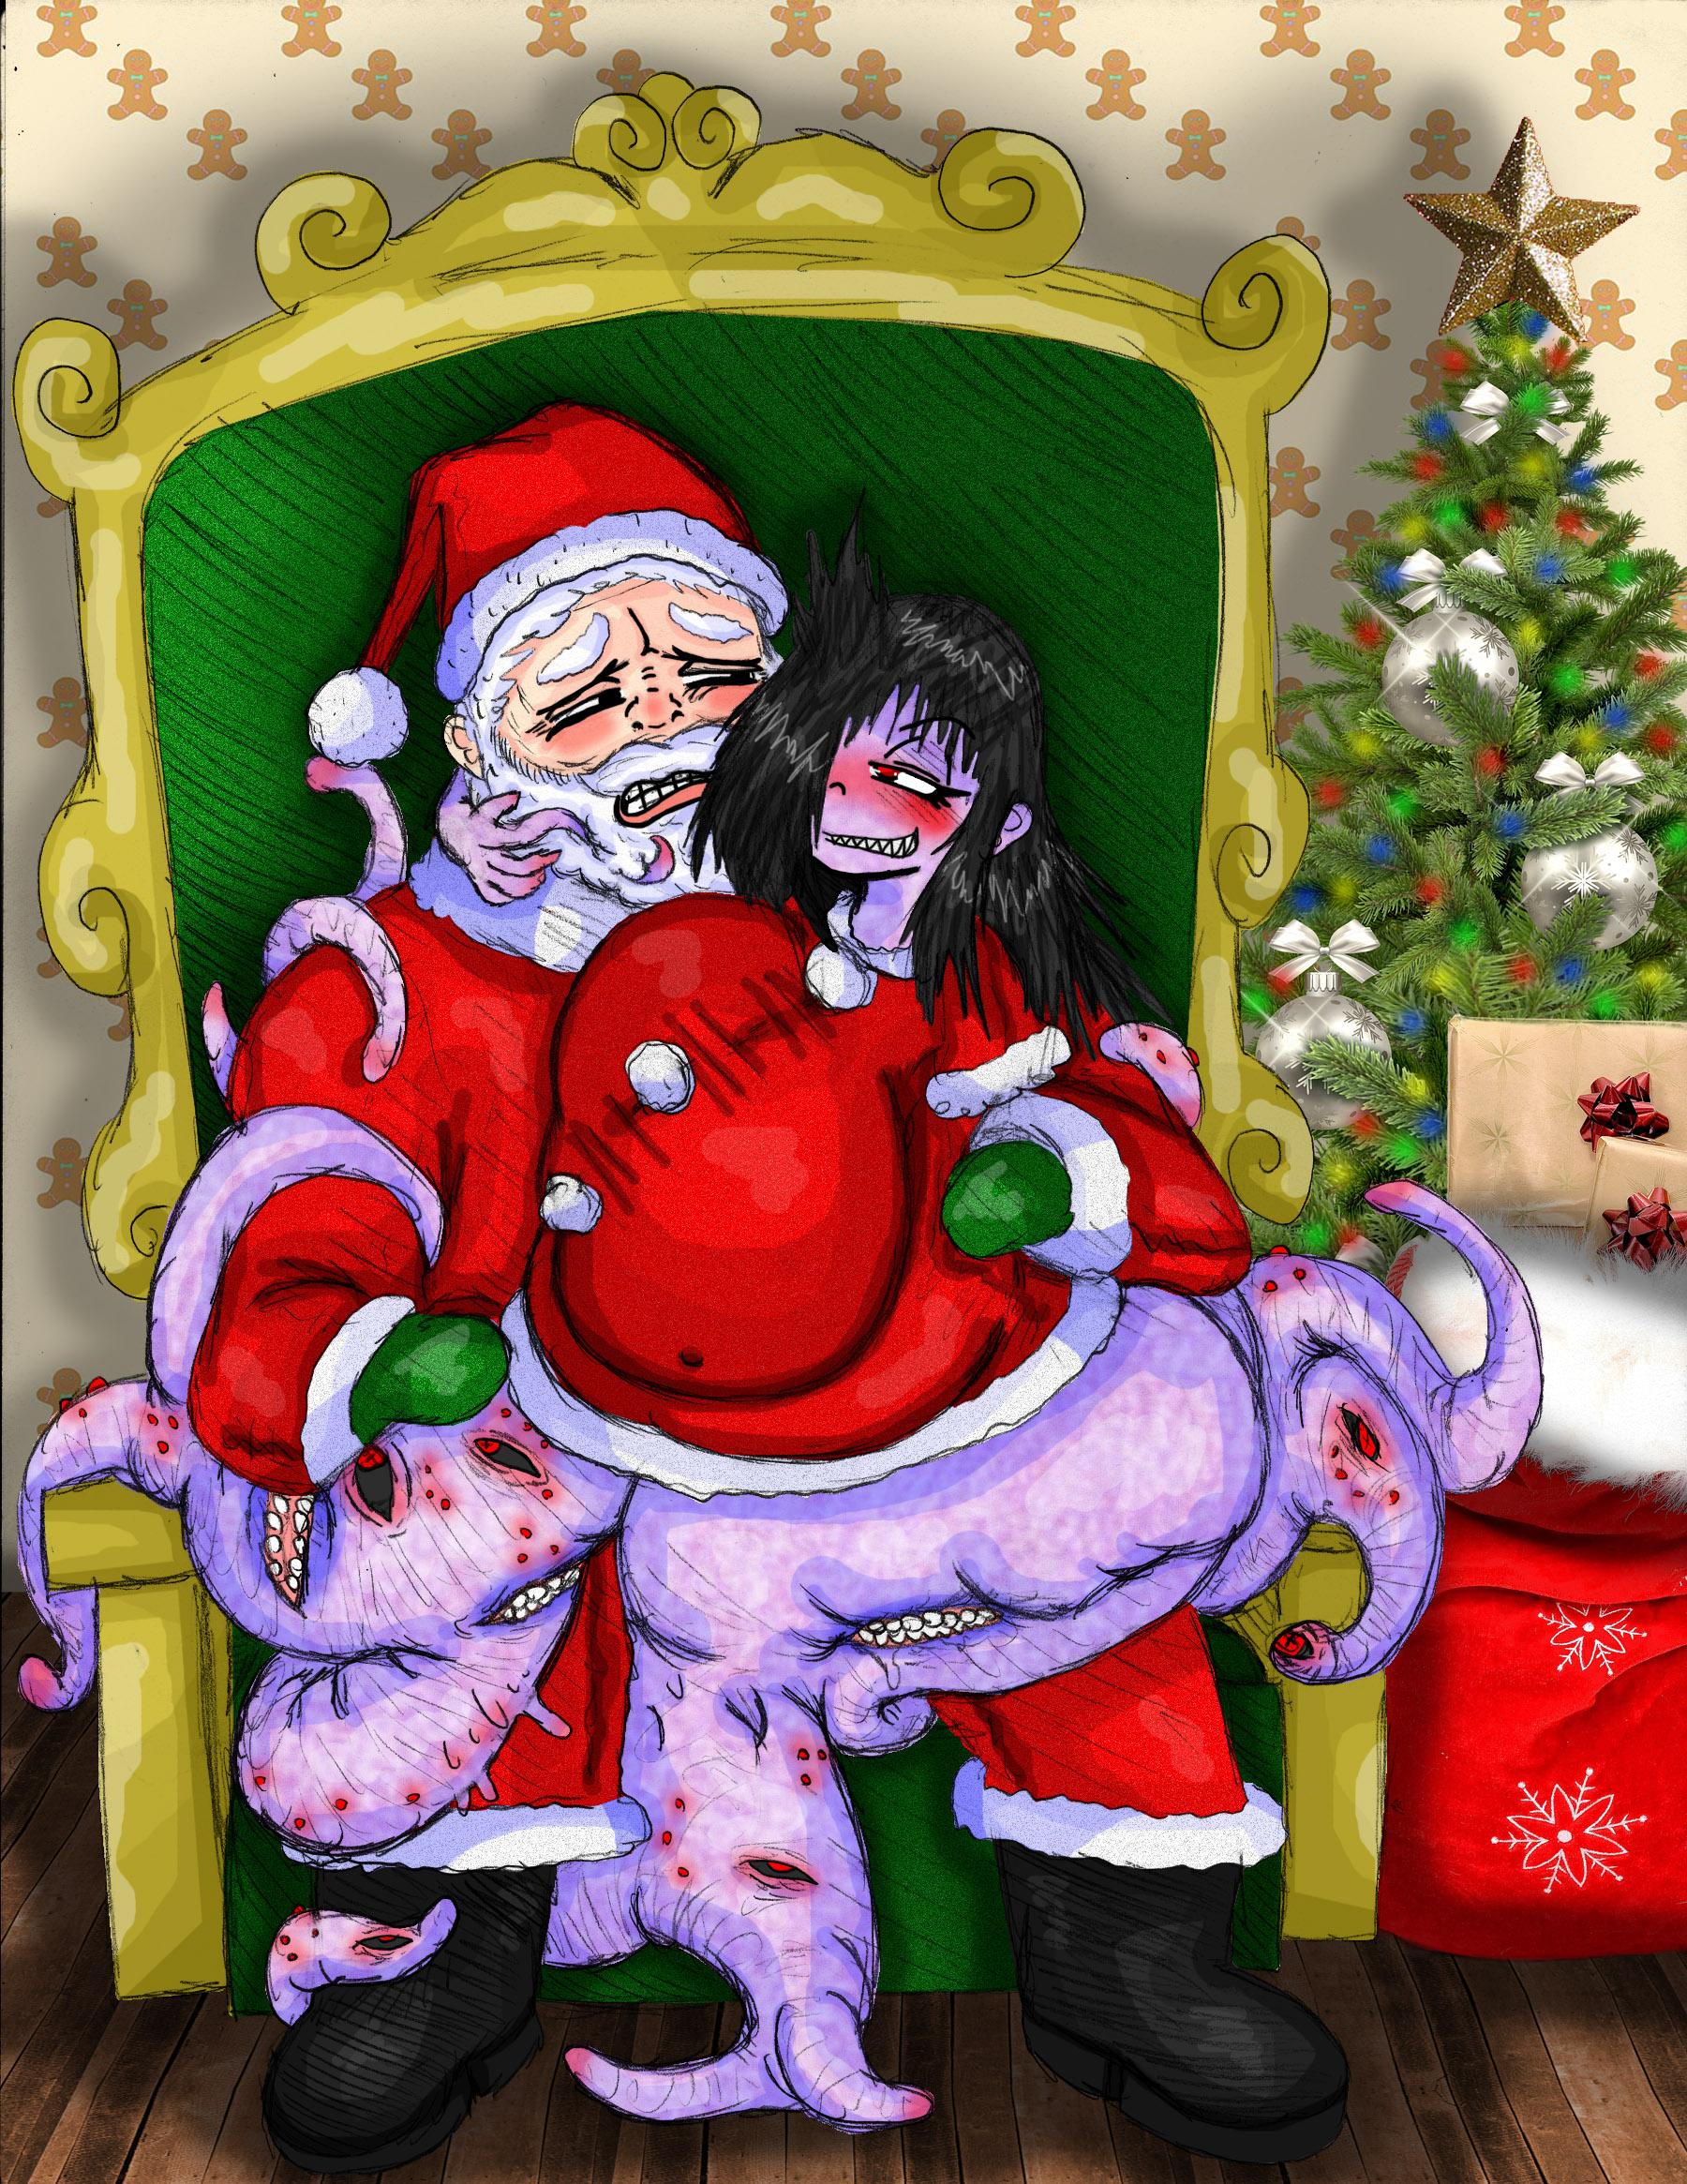 Laila and Santa